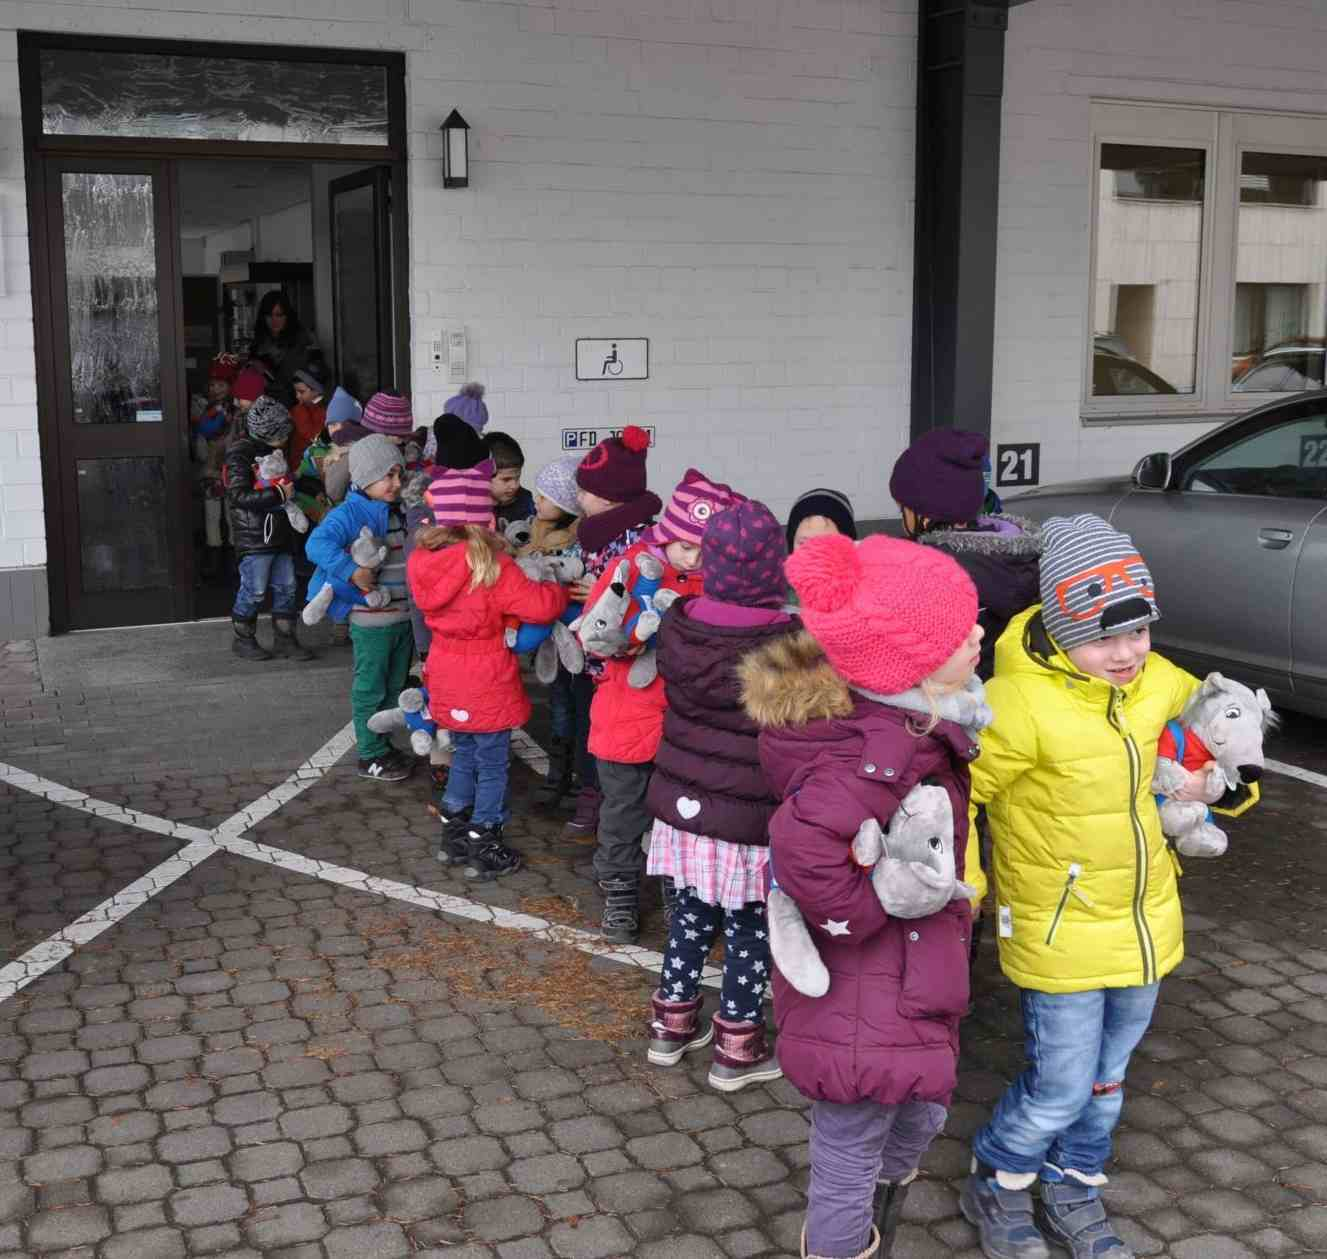 BUJ Besuch KinderBurg - mit Lorenzo 3 -  03-15.jpg